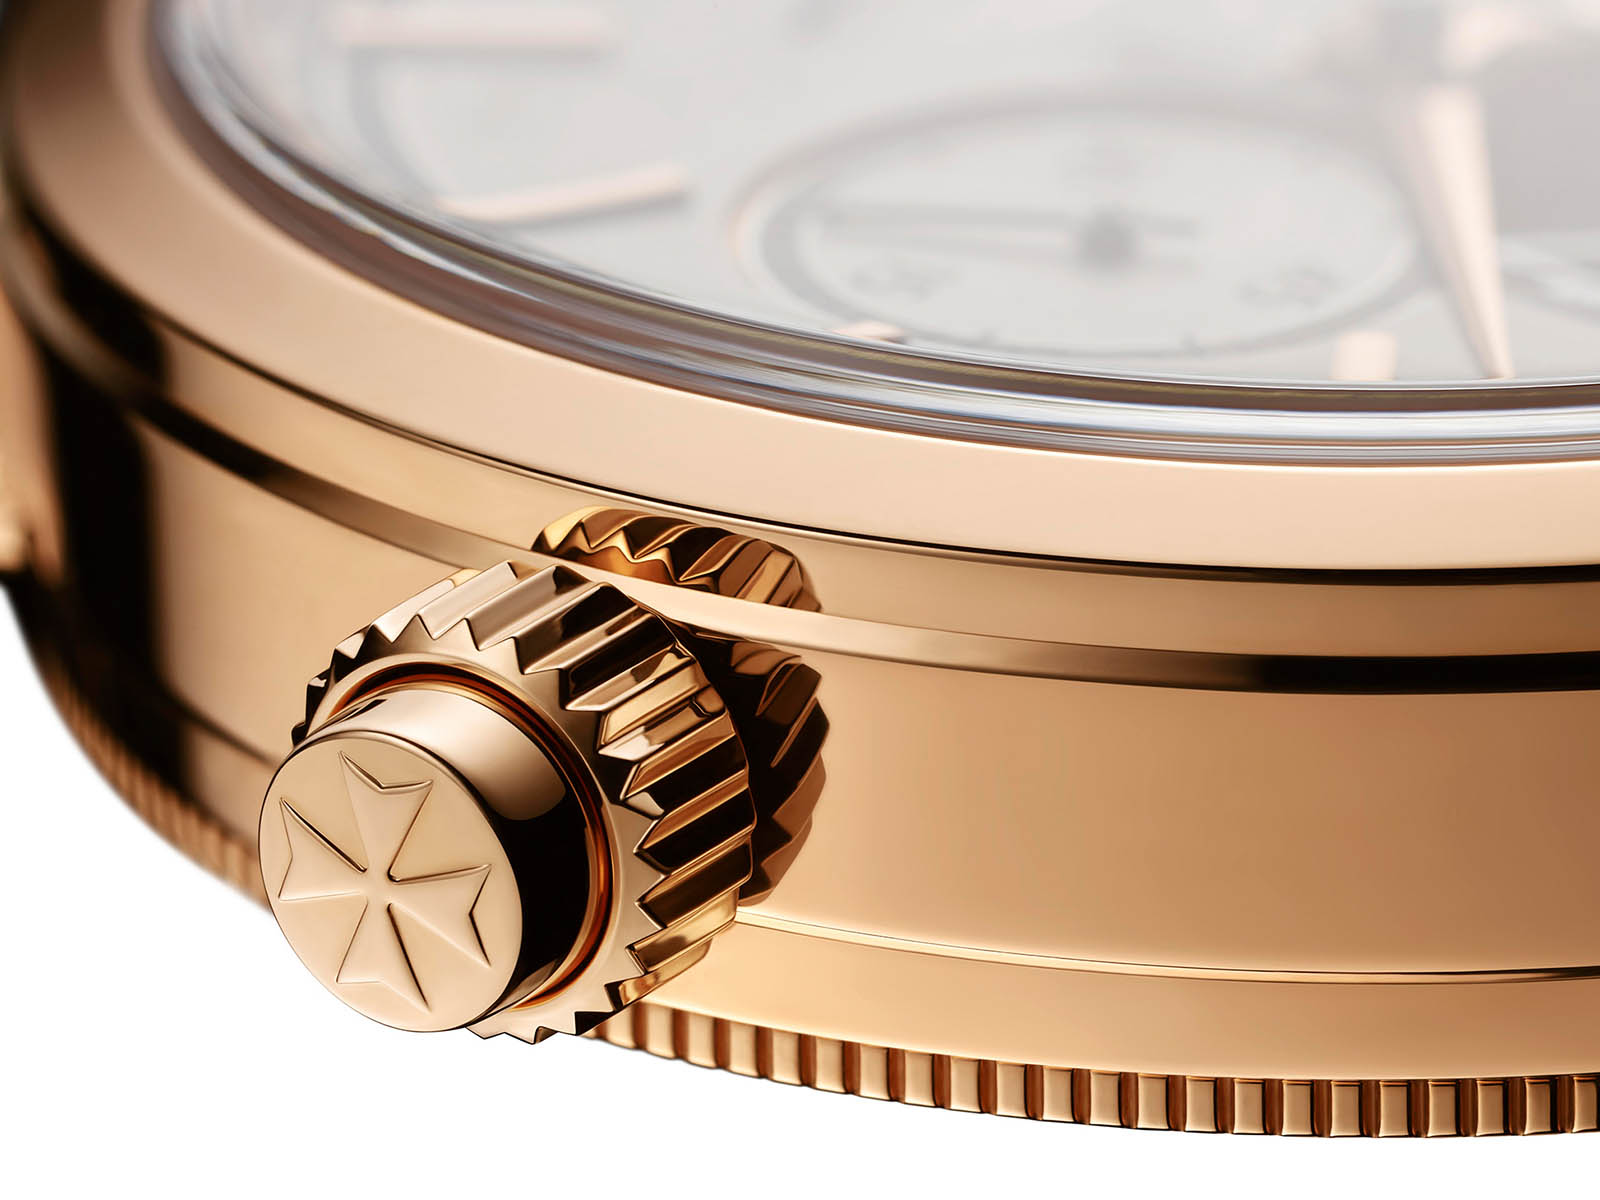 5100t-000r-b623-vacheron-constantin-traditionnelle-tourbillon-chronograph-4.jpg